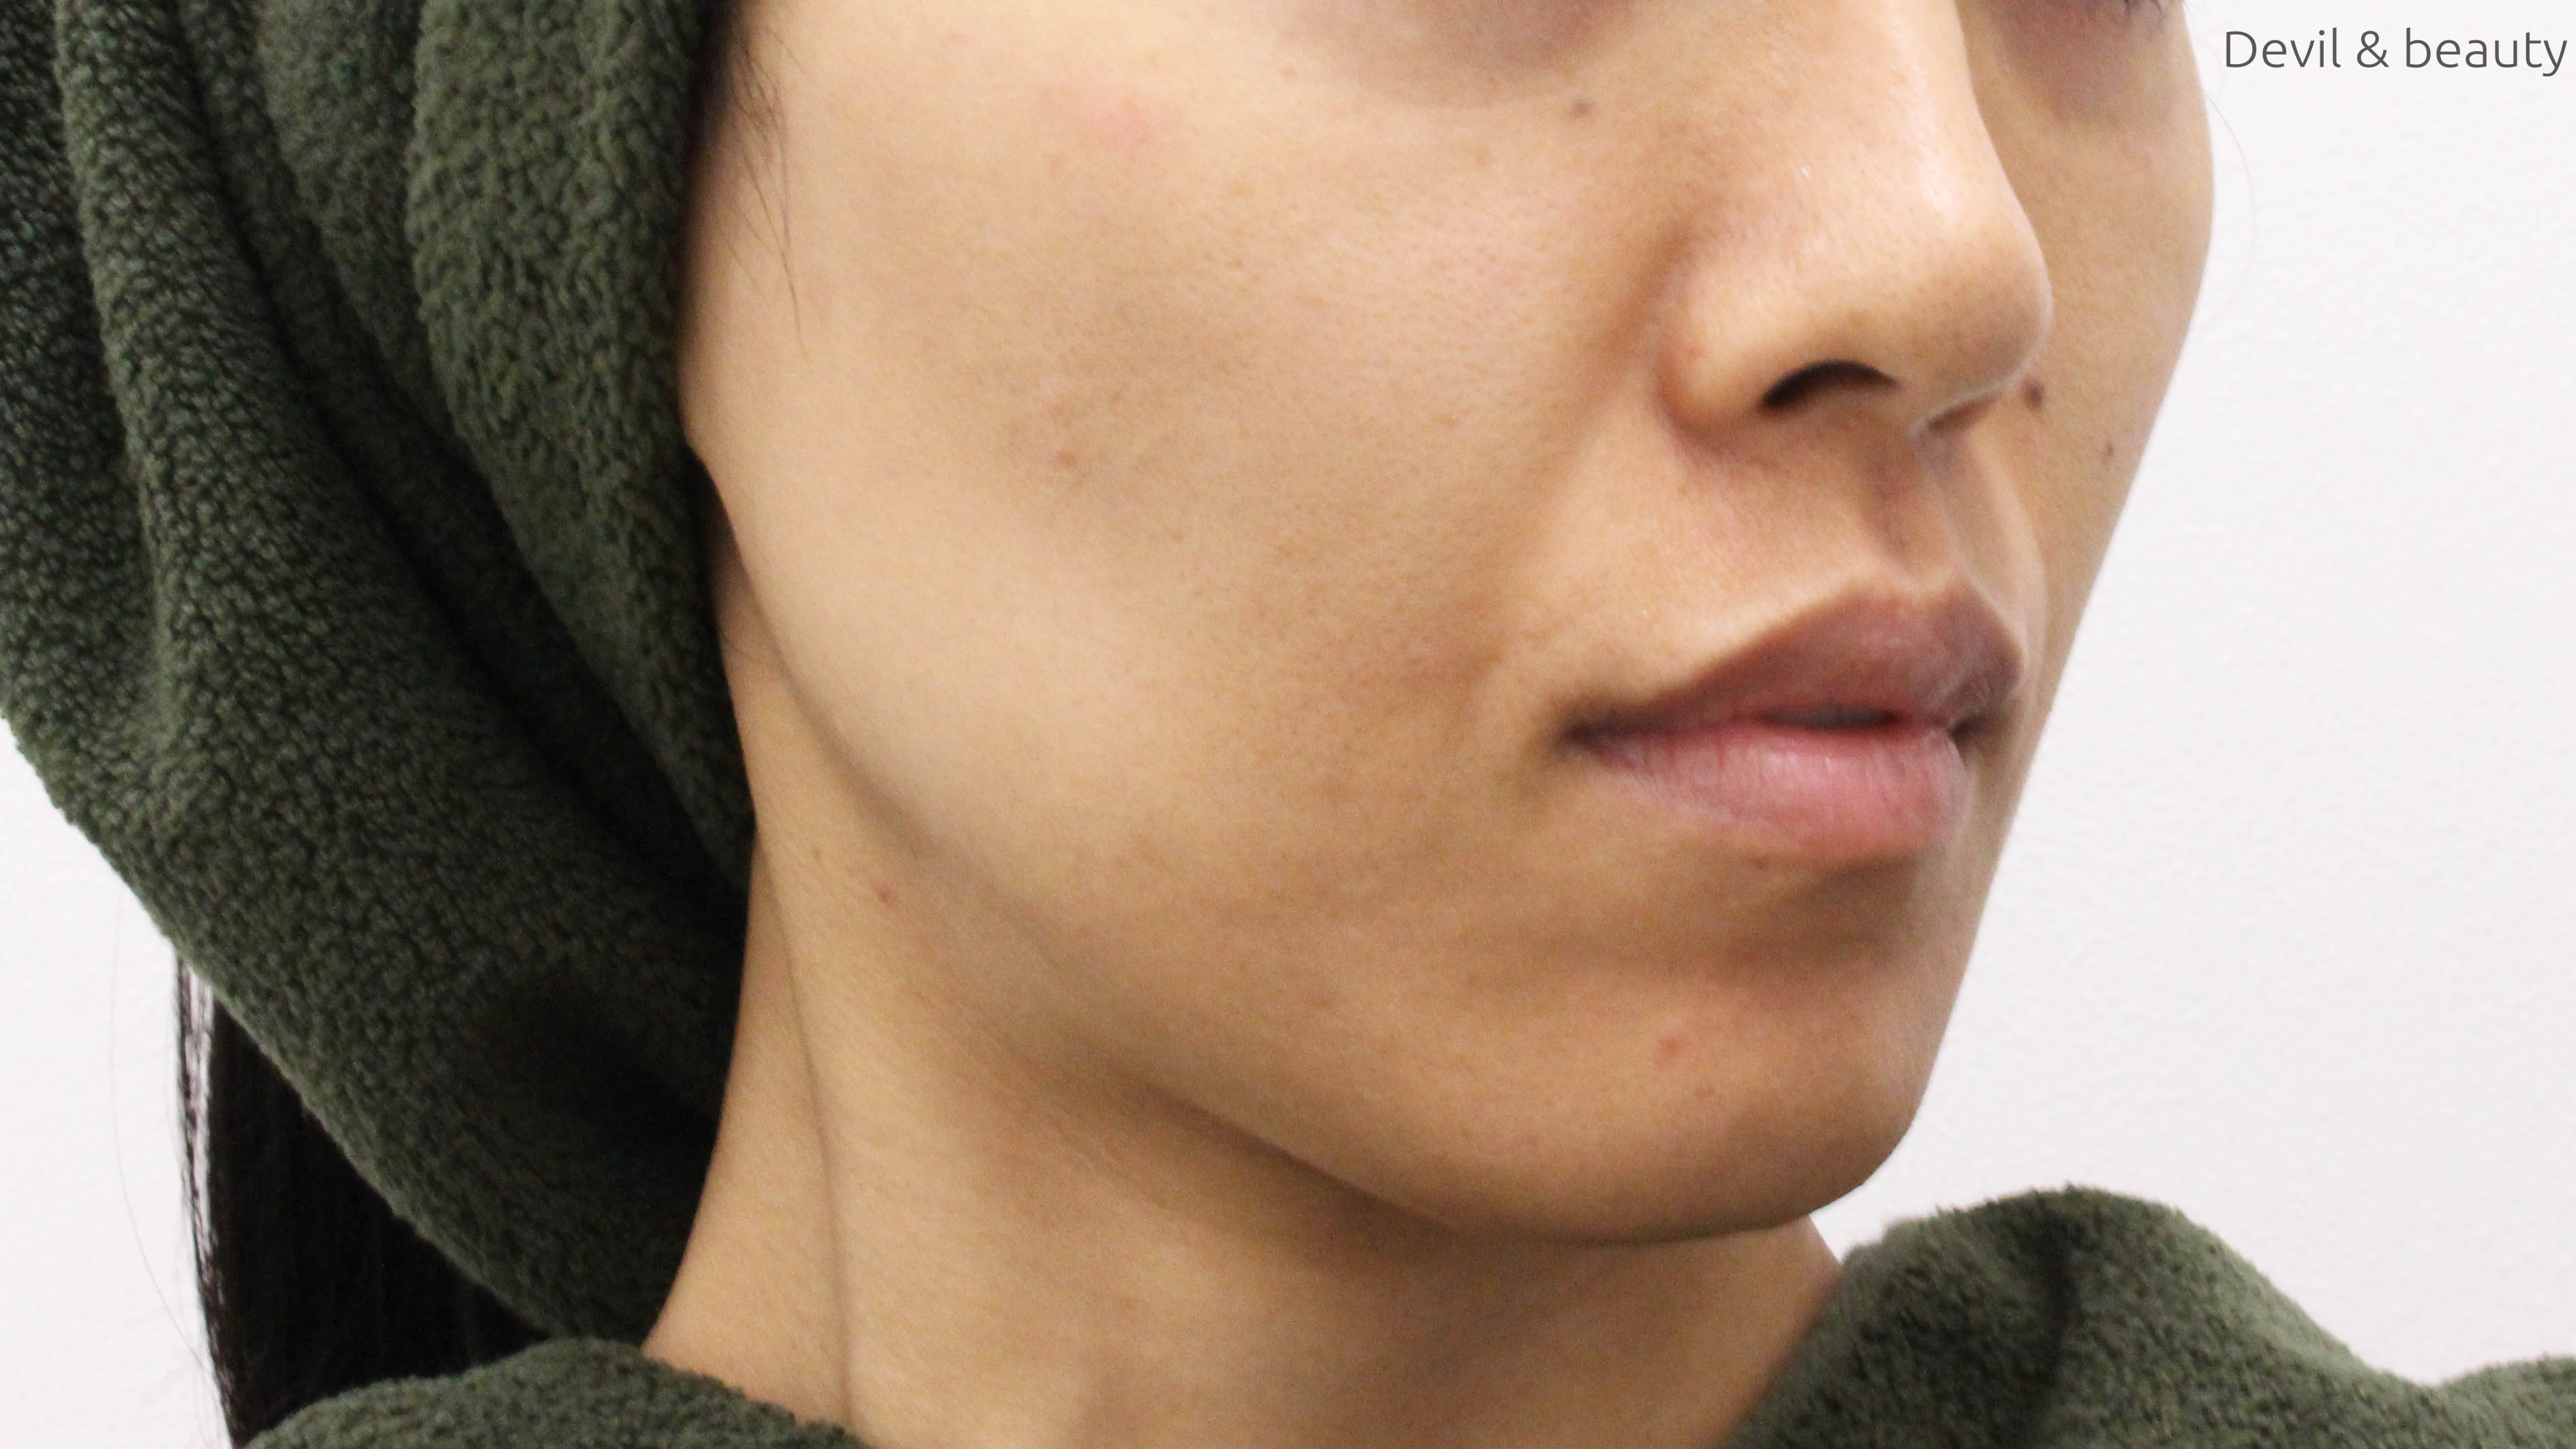 before-face-hair-loss-toitoitoi-clinic2-1 - image